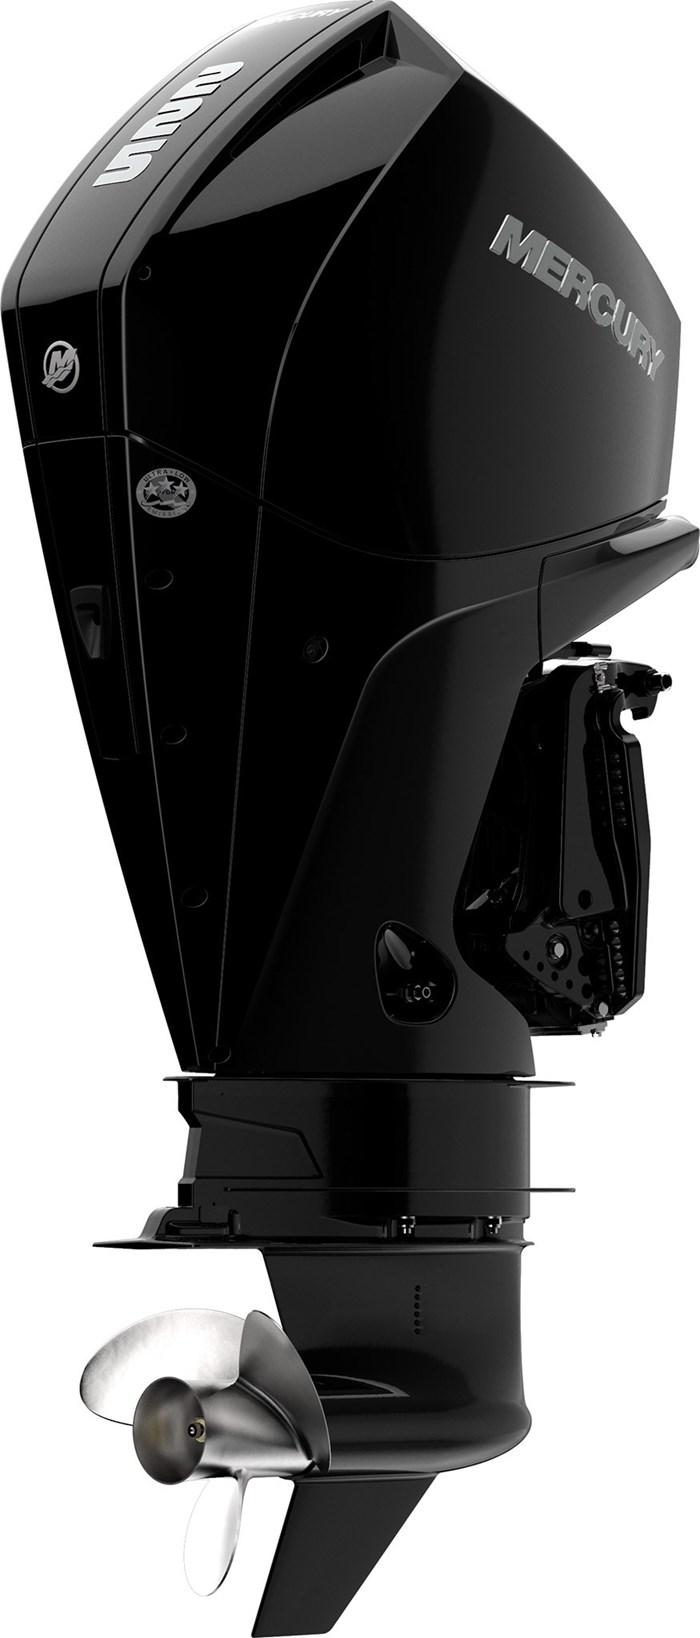 2021 Mercury 225XL V-6 4-Stroke DTS Photo 11 of 24